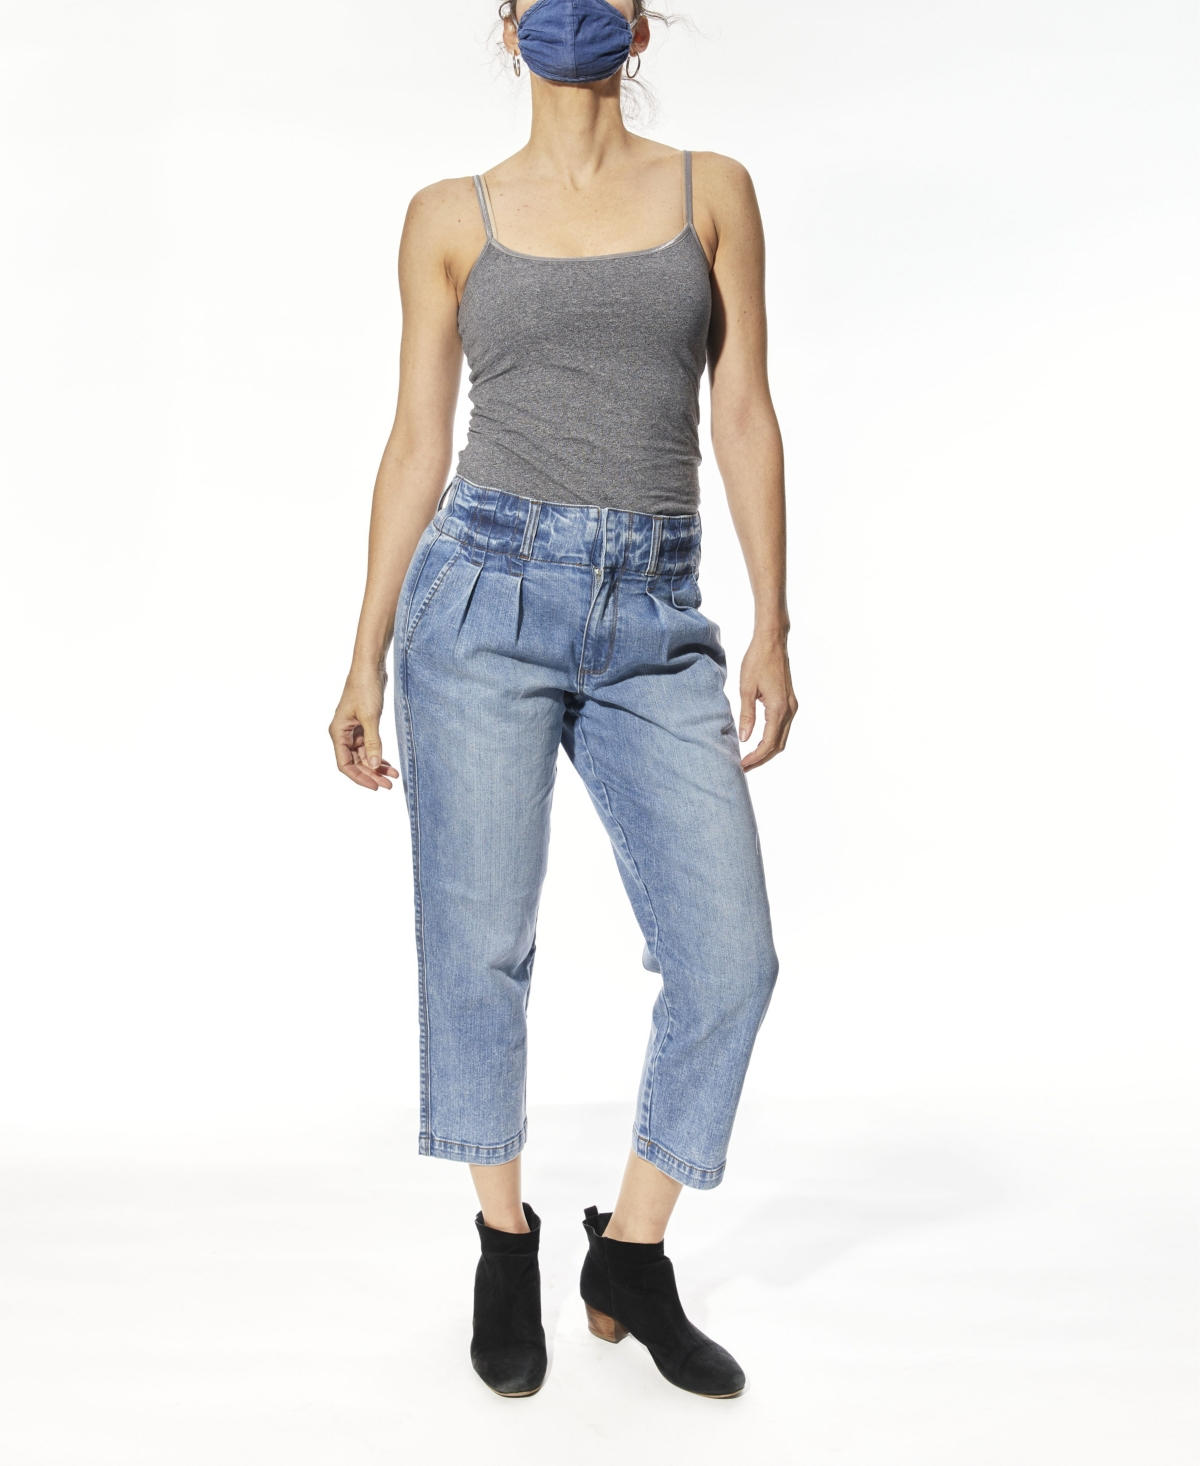 Women's High Rise Front Pleat Jeans